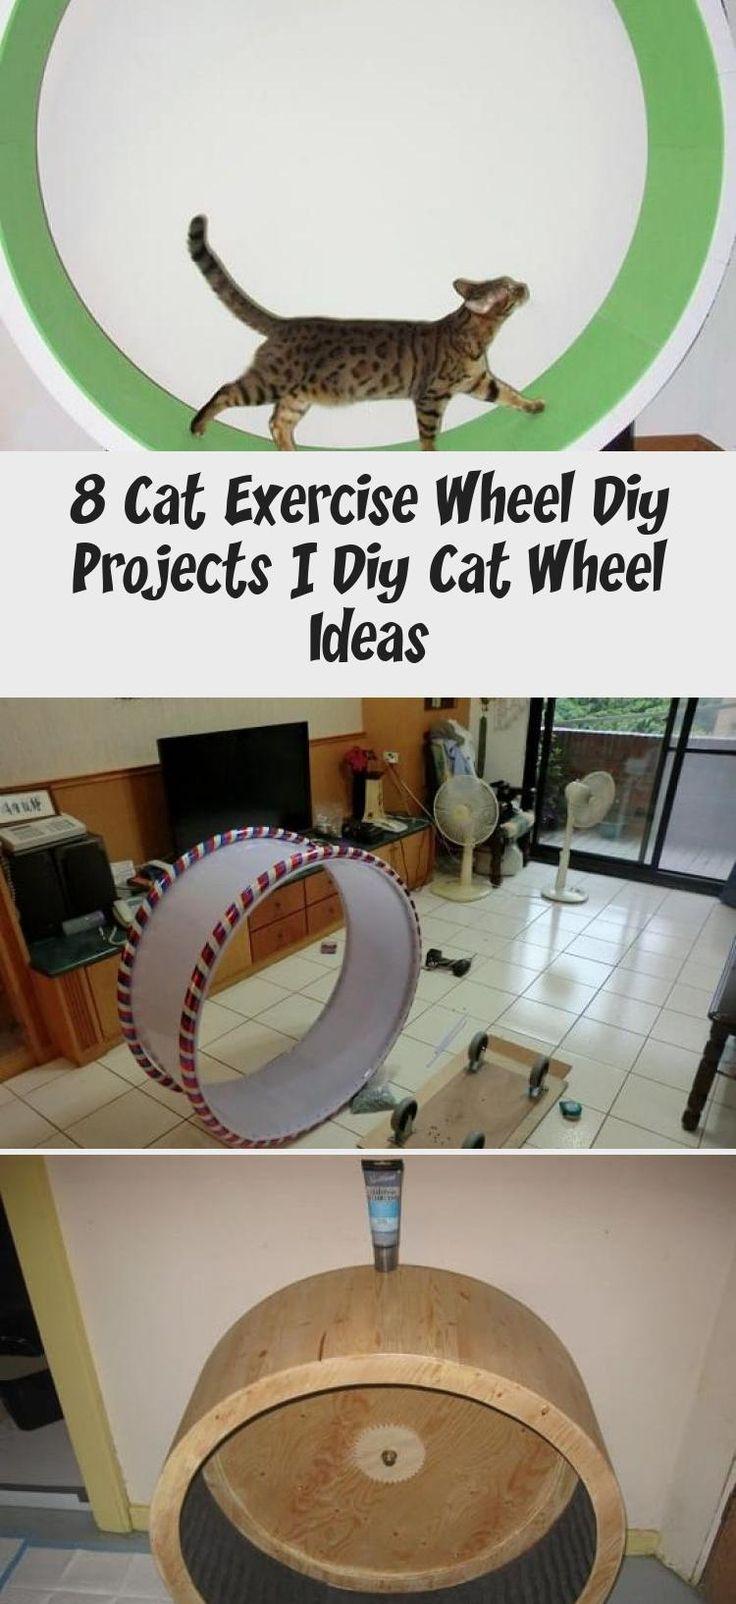 8 cat exercise wheel diy projects diy cat wheel ideas